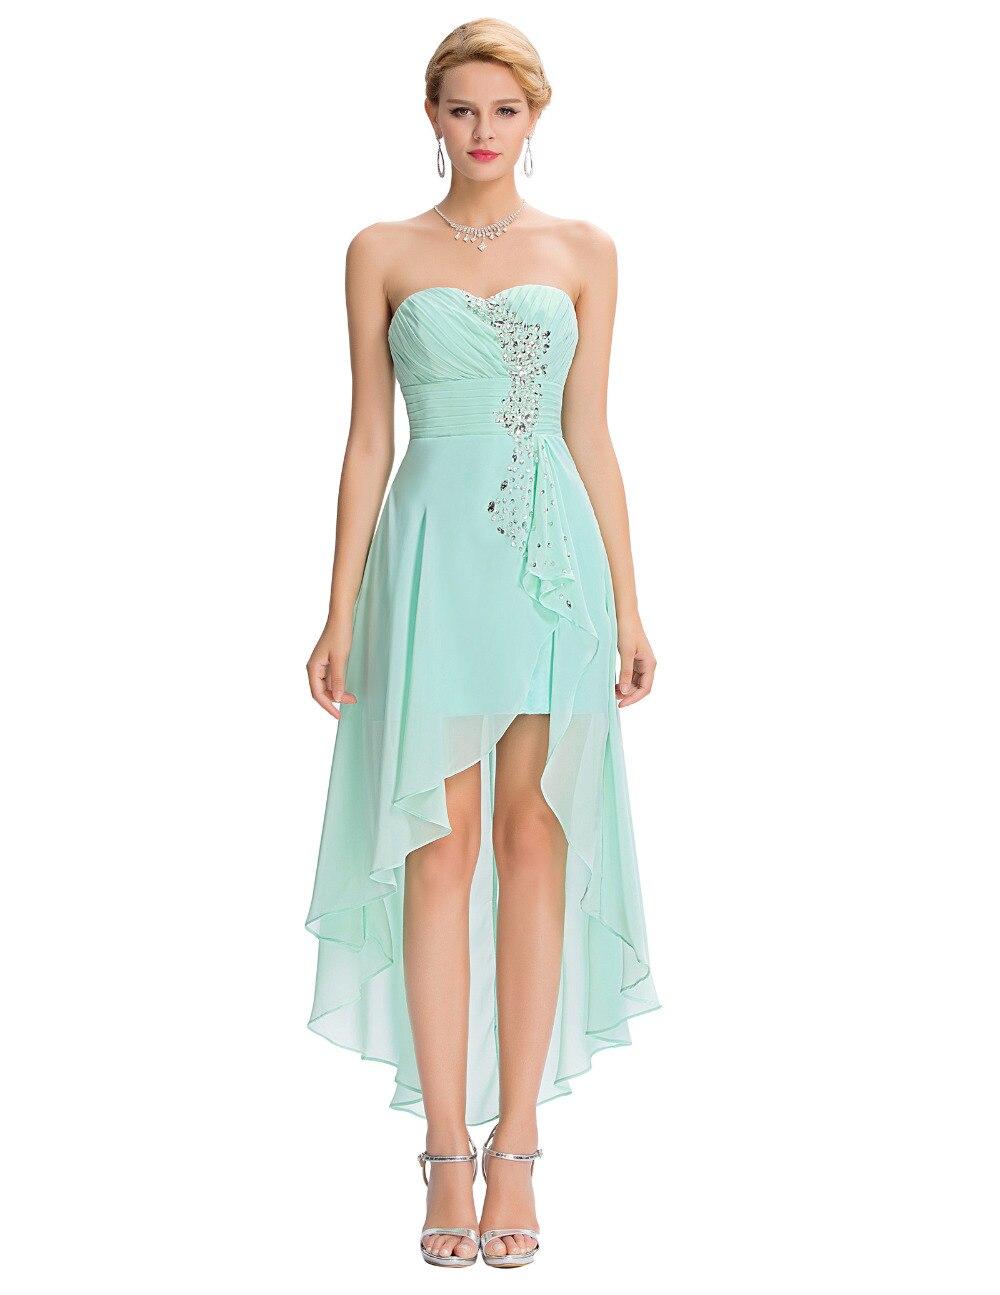 Fantastic Skimpy Prom Dress Images - All Wedding Dresses ...